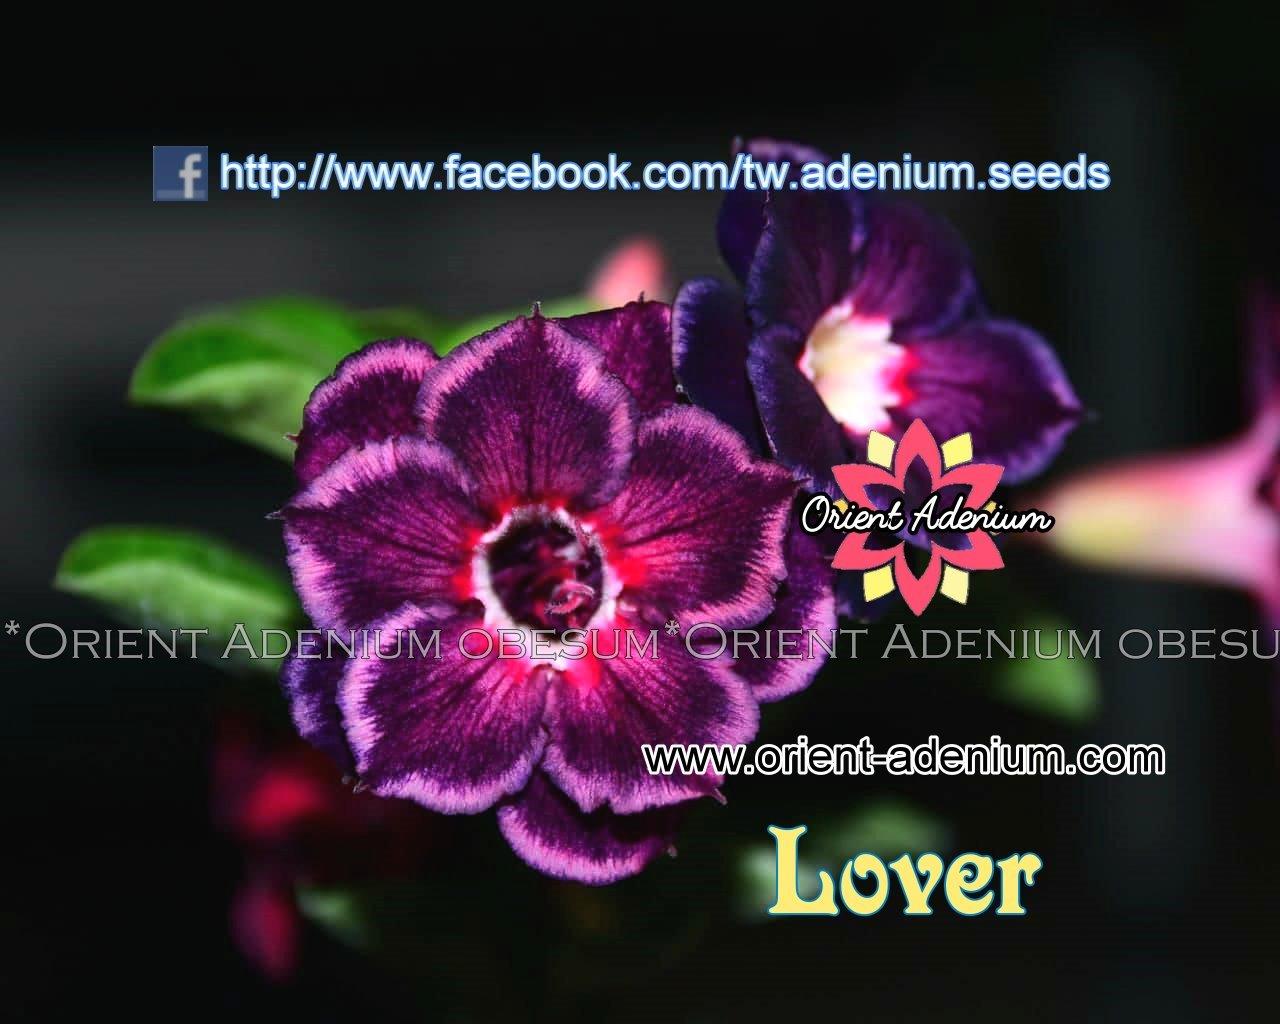 Адениум Тучный Lover